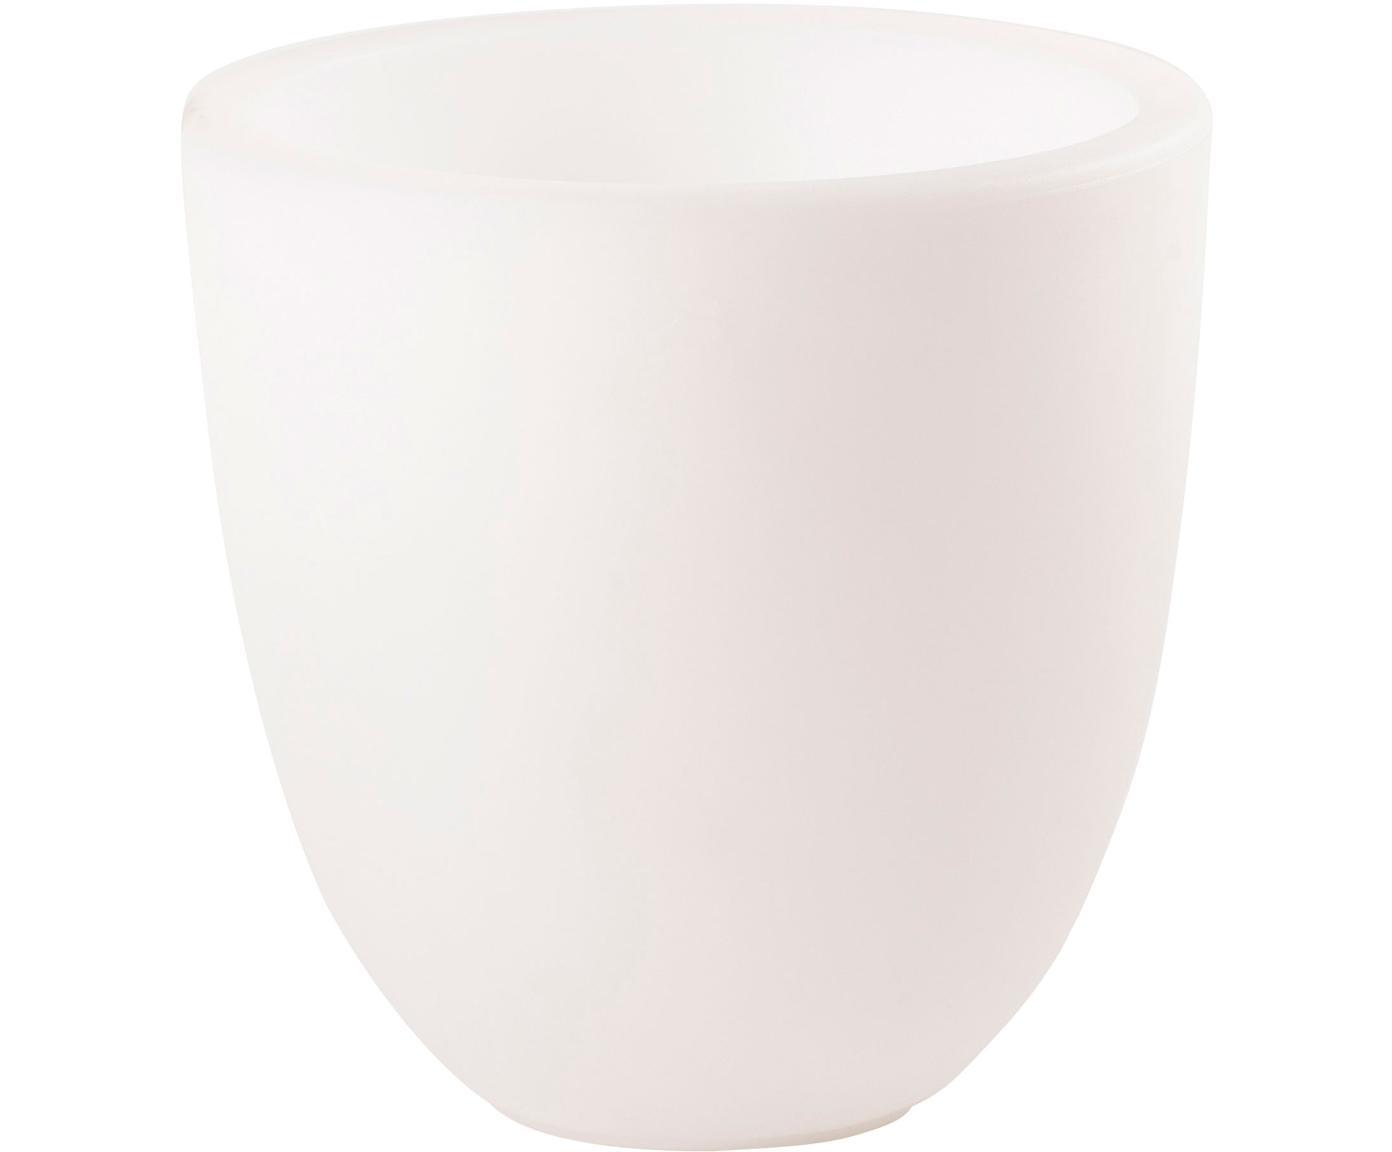 Lampada da esterno portatile Shining Curvy Pot, Materiale sintetico, Bianco, Ø 39 x Alt. 39 cm